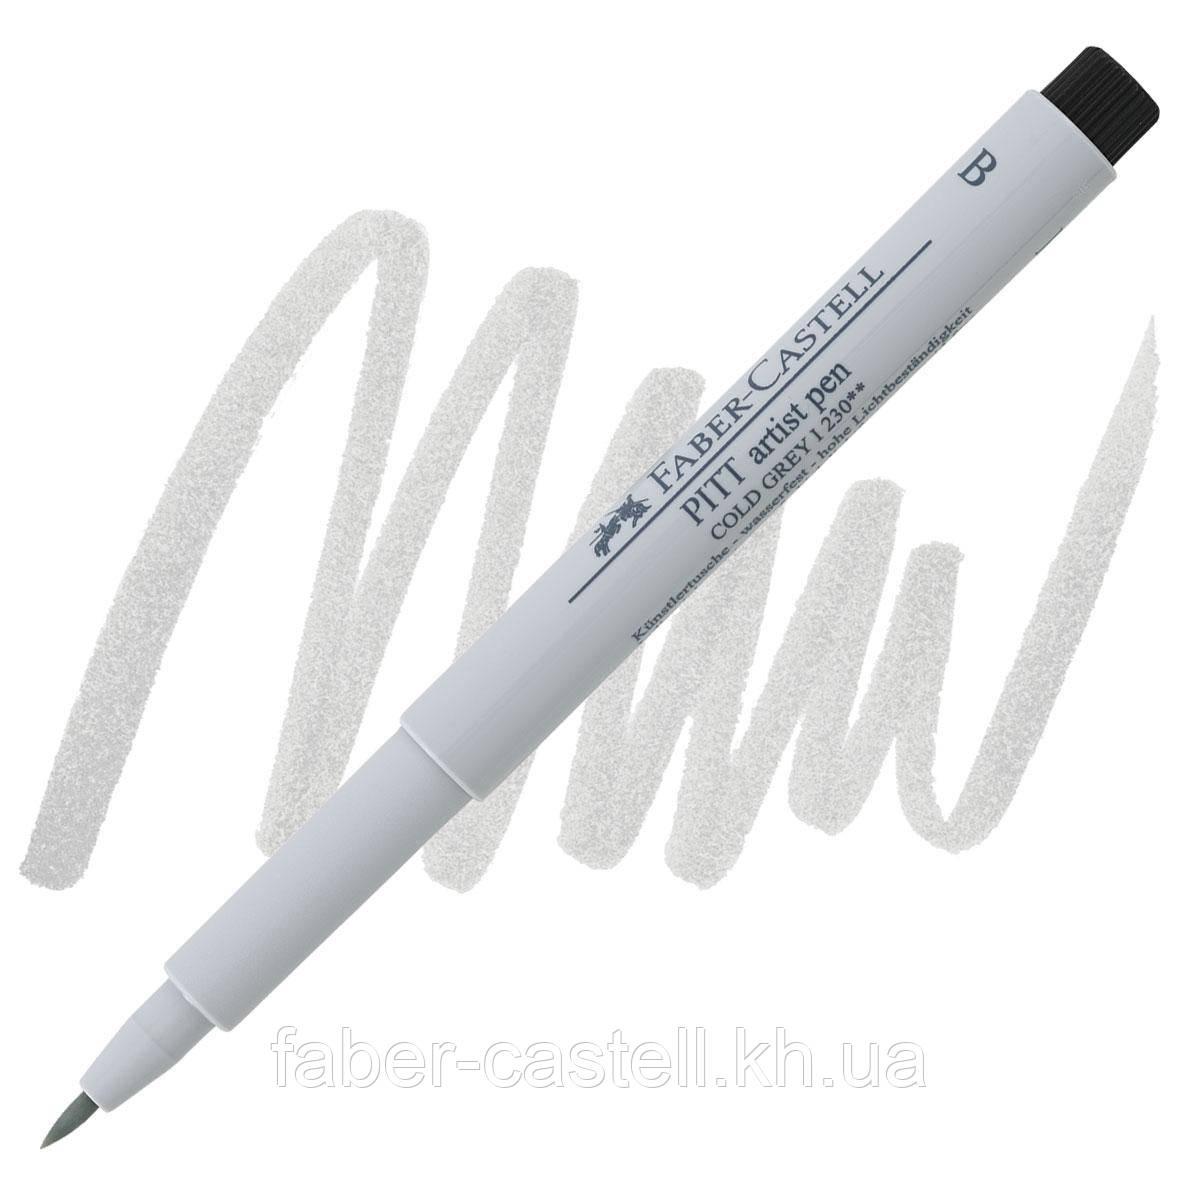 "Ручка-кисточка капиллярная Faber - Castell PITT® ARTIST PEN ""BRUSH"" № 230  холодный серый I, 167430"